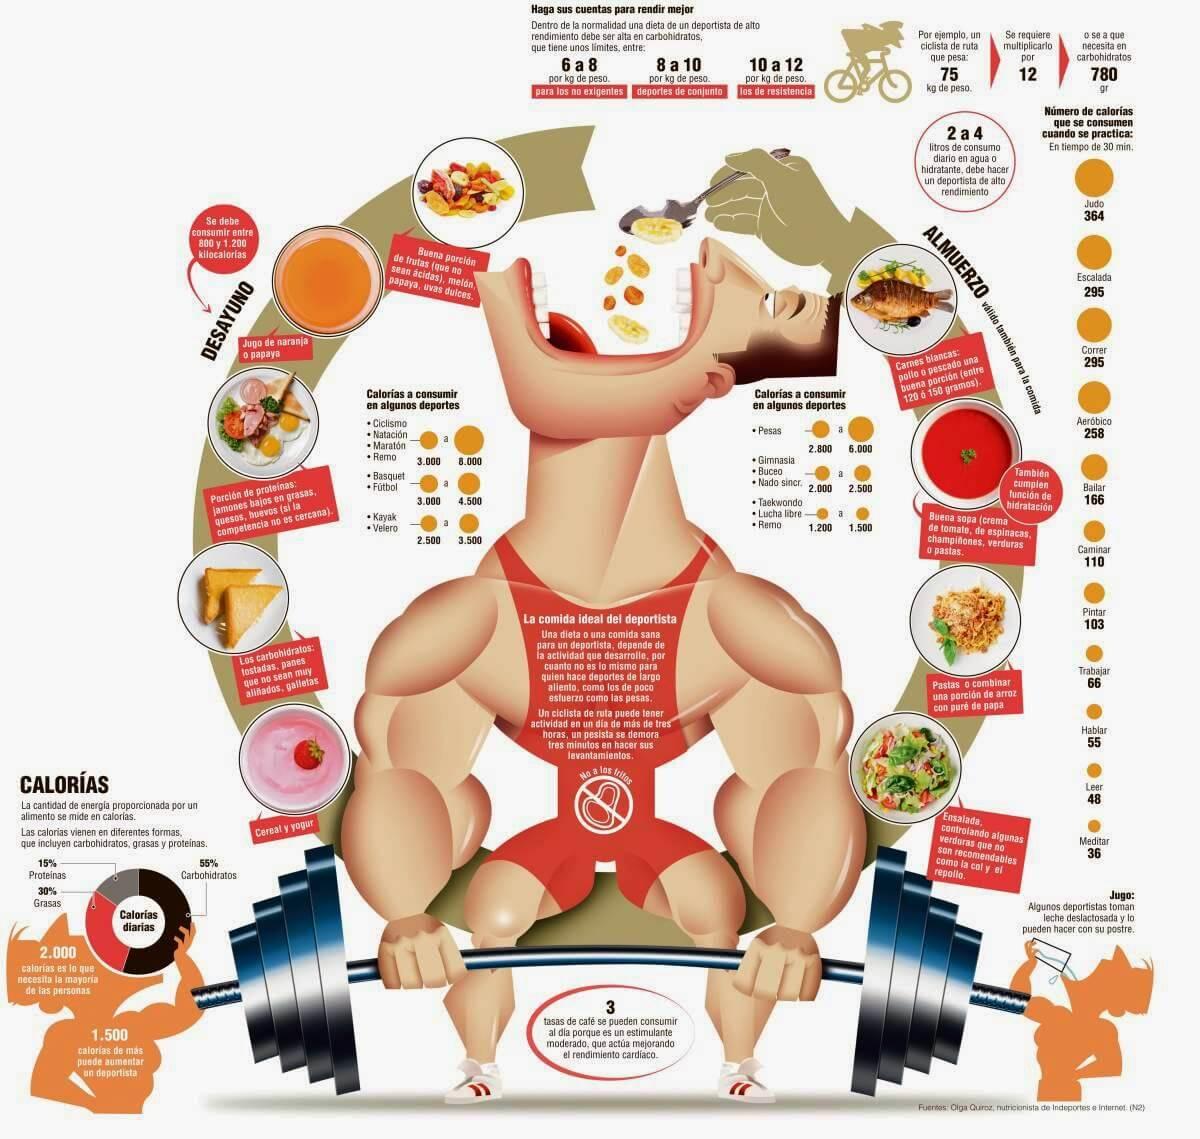 Dieta-deportistas-comida-1200-16112013